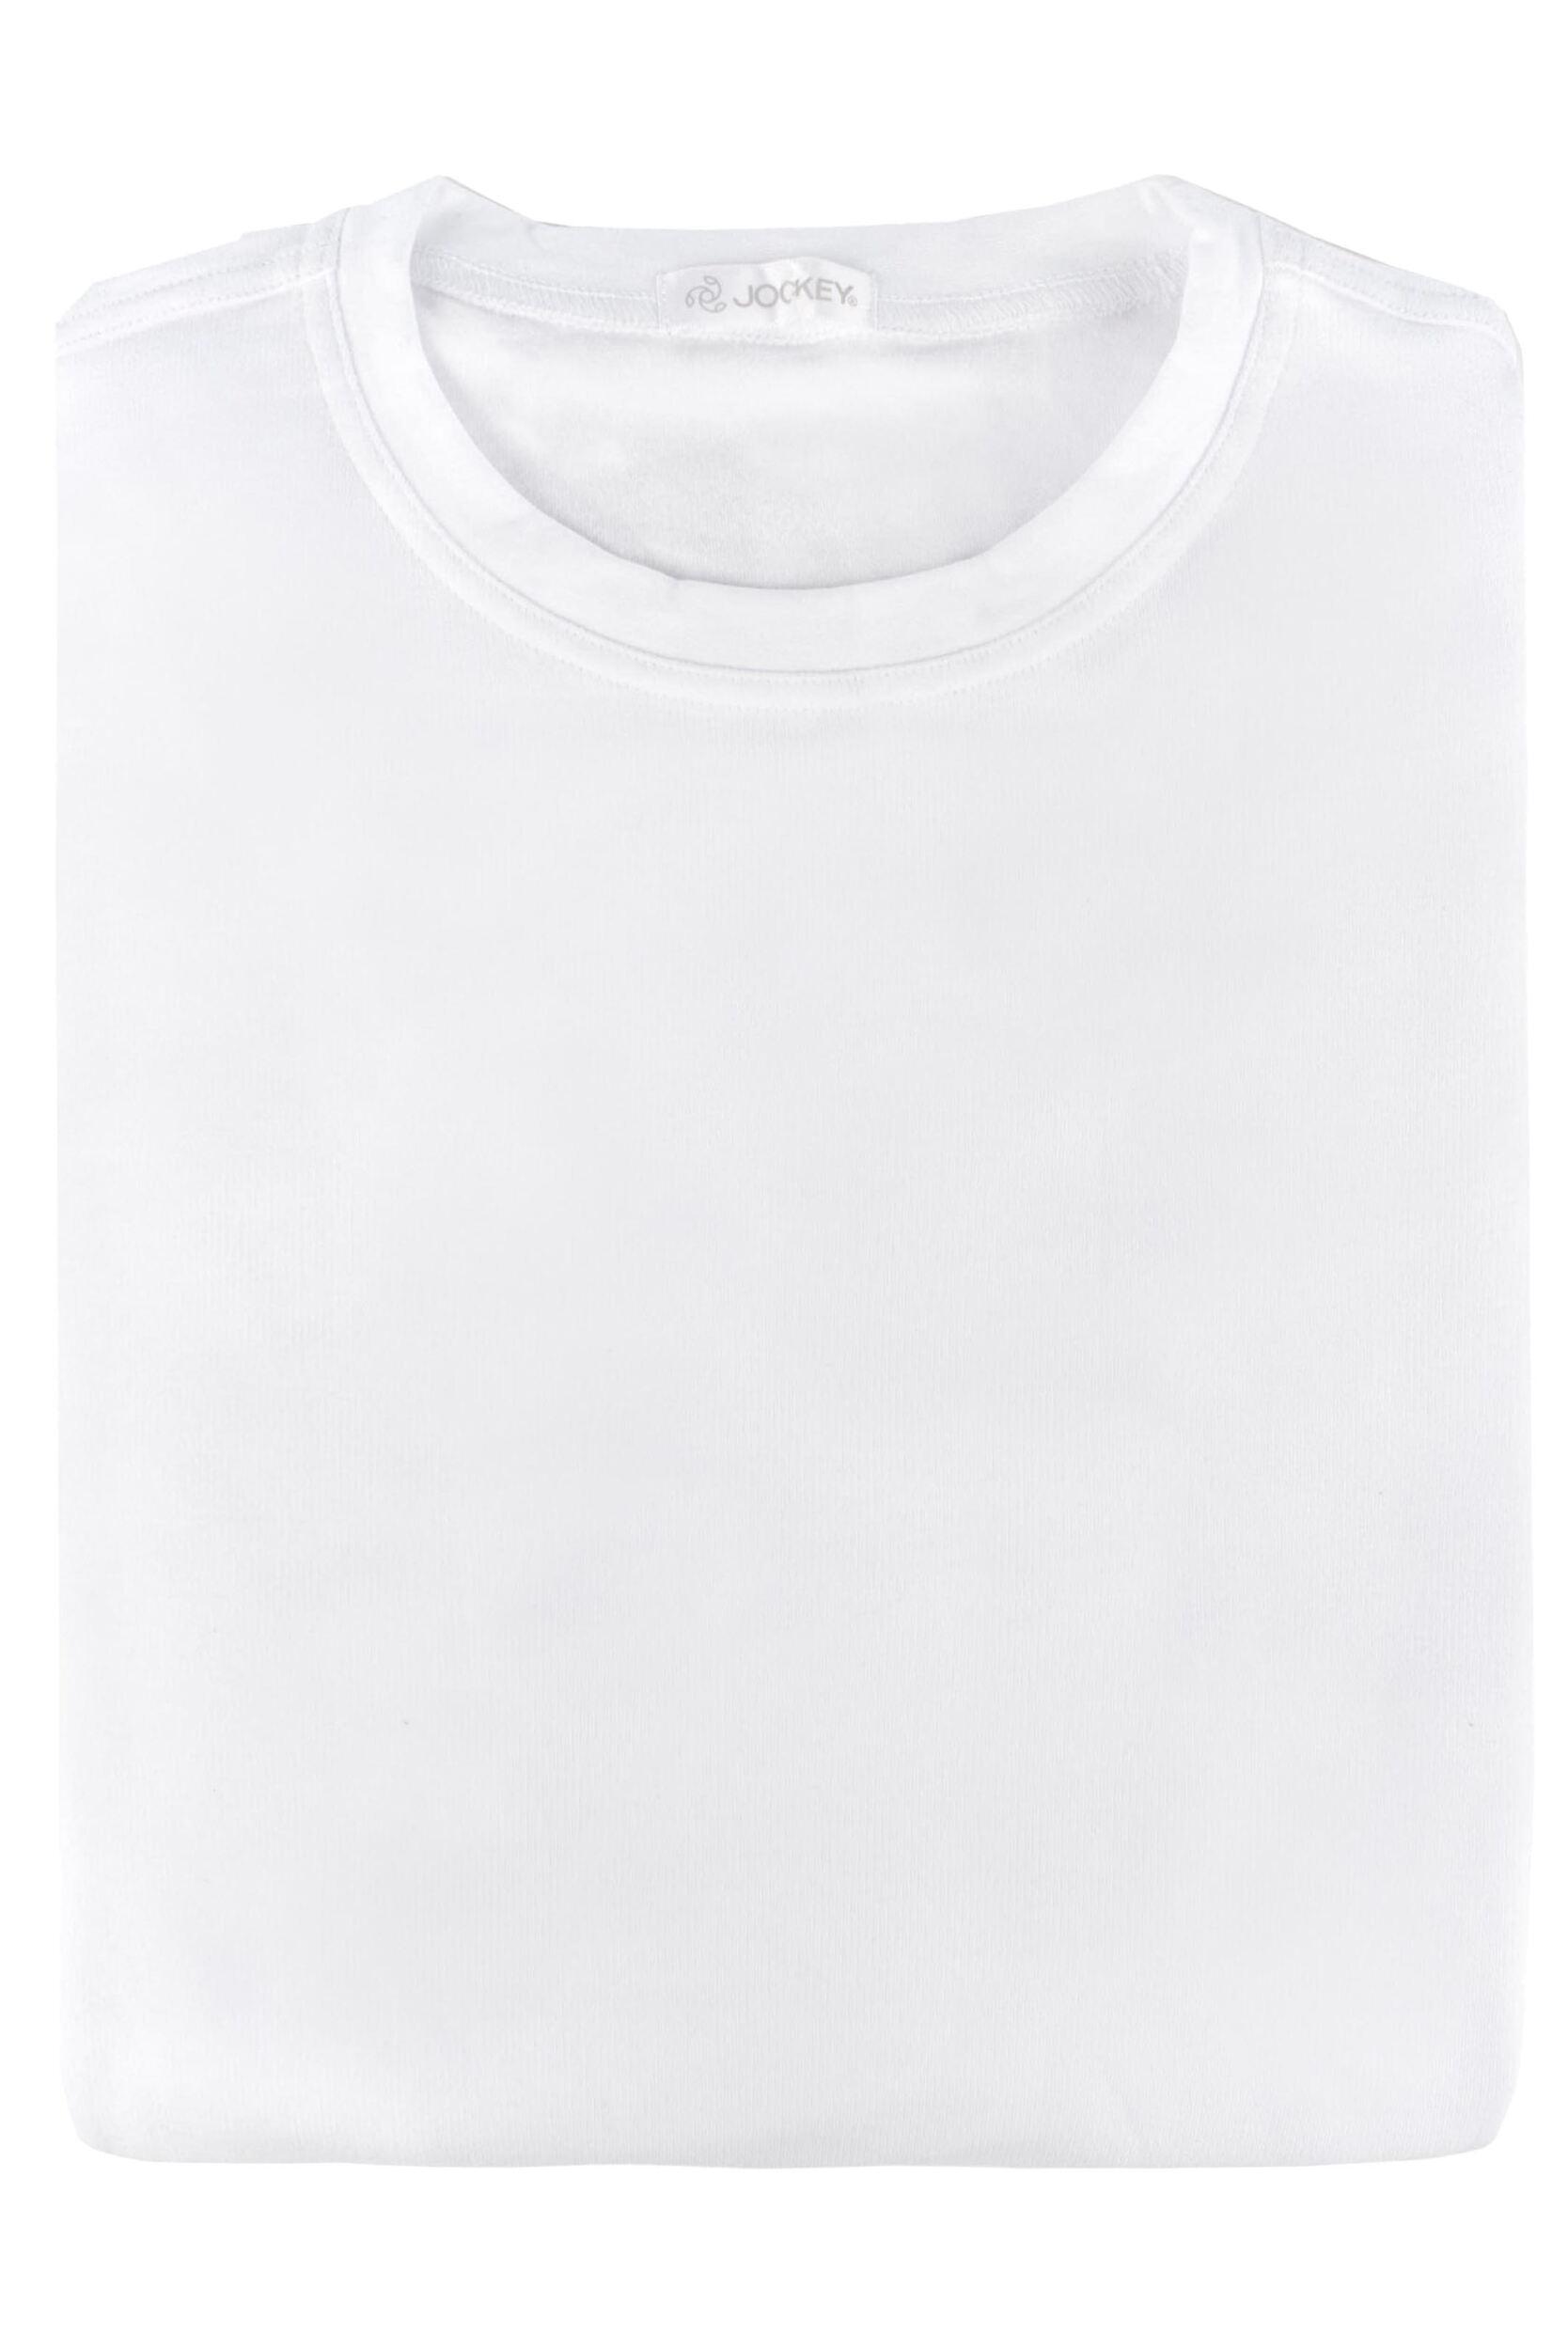 Image of Mens 1 Pack Jockey Thermal Crew Neck Long Sleeve T-Shirt